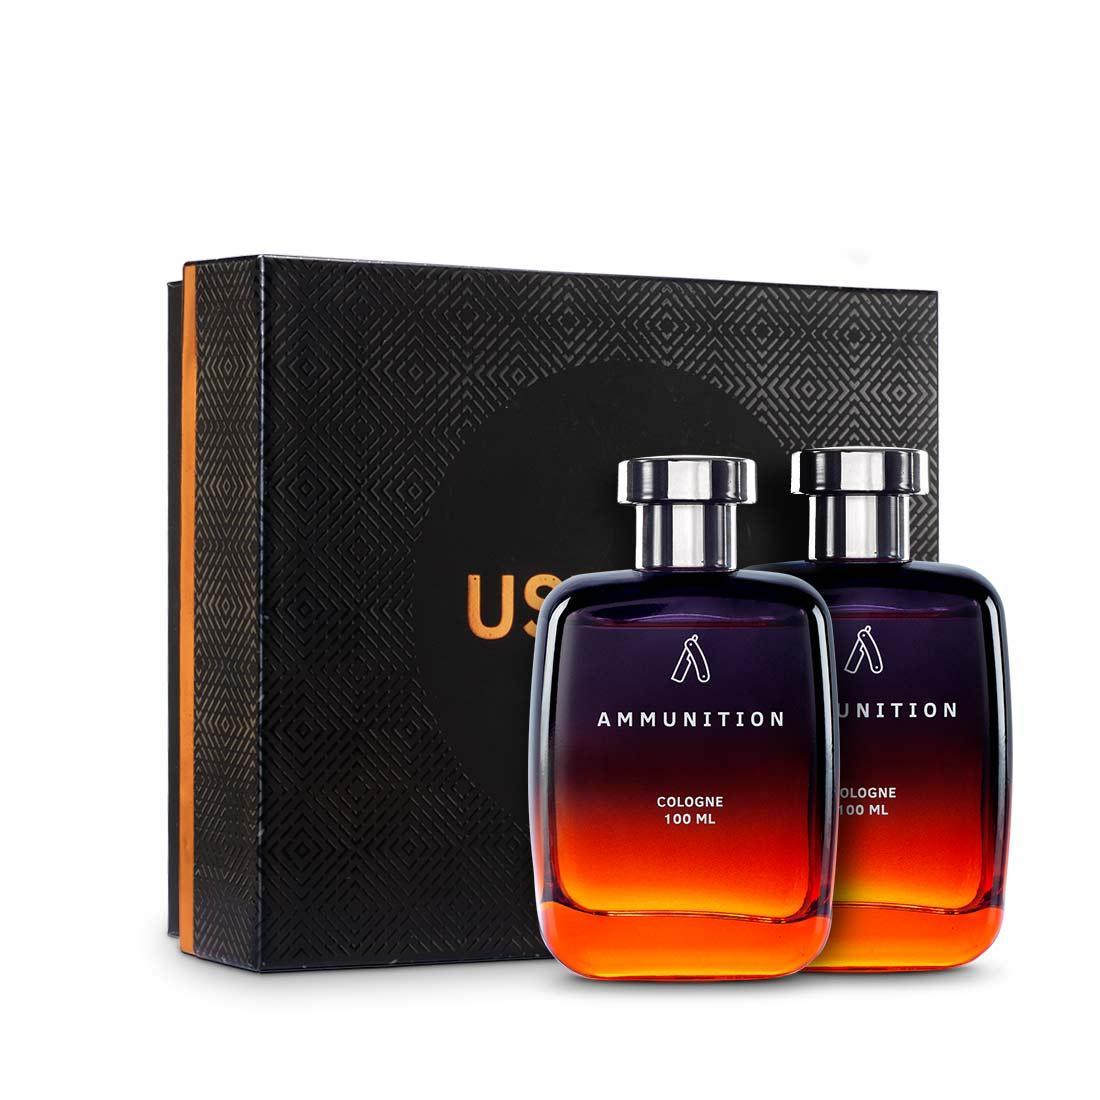 Fragrance Gift Box - Ammunition Cologne 100ml - Set of 2